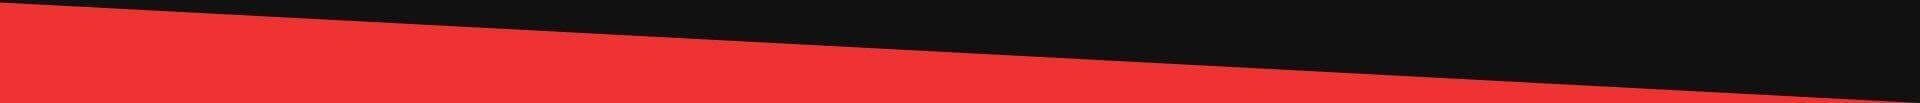 https://kibo-robo.jp/wp-content/uploads/2019/07/red-triangle-1920x103.jpg